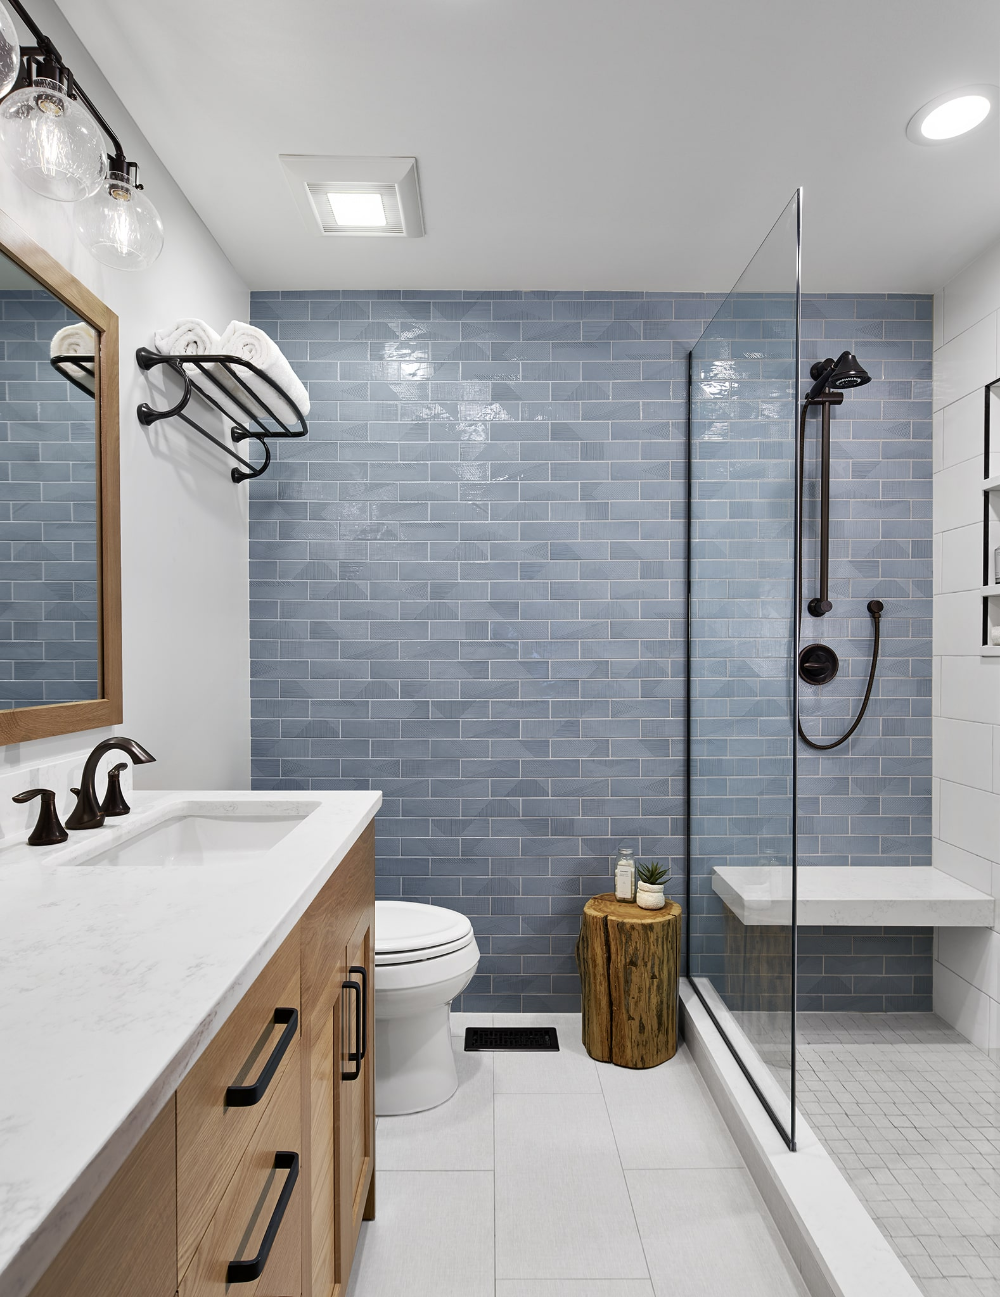 Bathroom Portfolio Chicago Interior Designers Lugbill Designs Bathroom Interior Design Bathroom Design Bathroom Interior